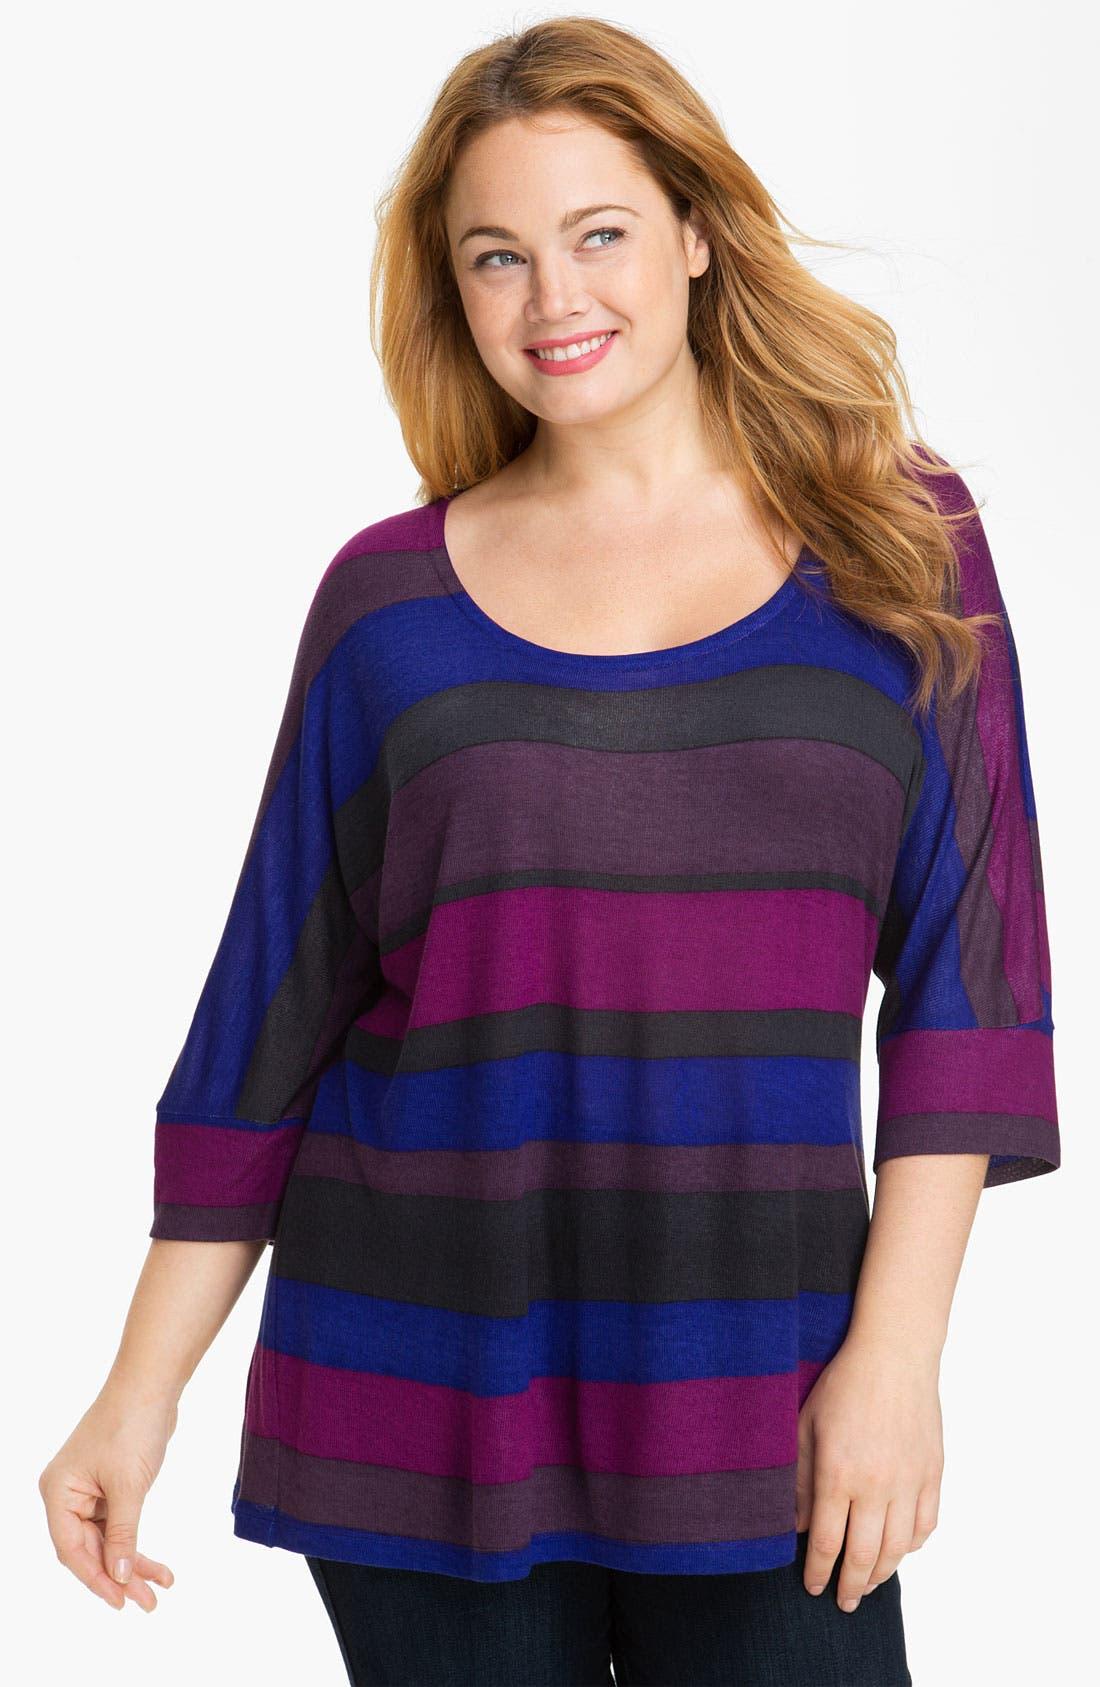 Alternate Image 1 Selected - Splendid Stripe Knit Top (Plus)